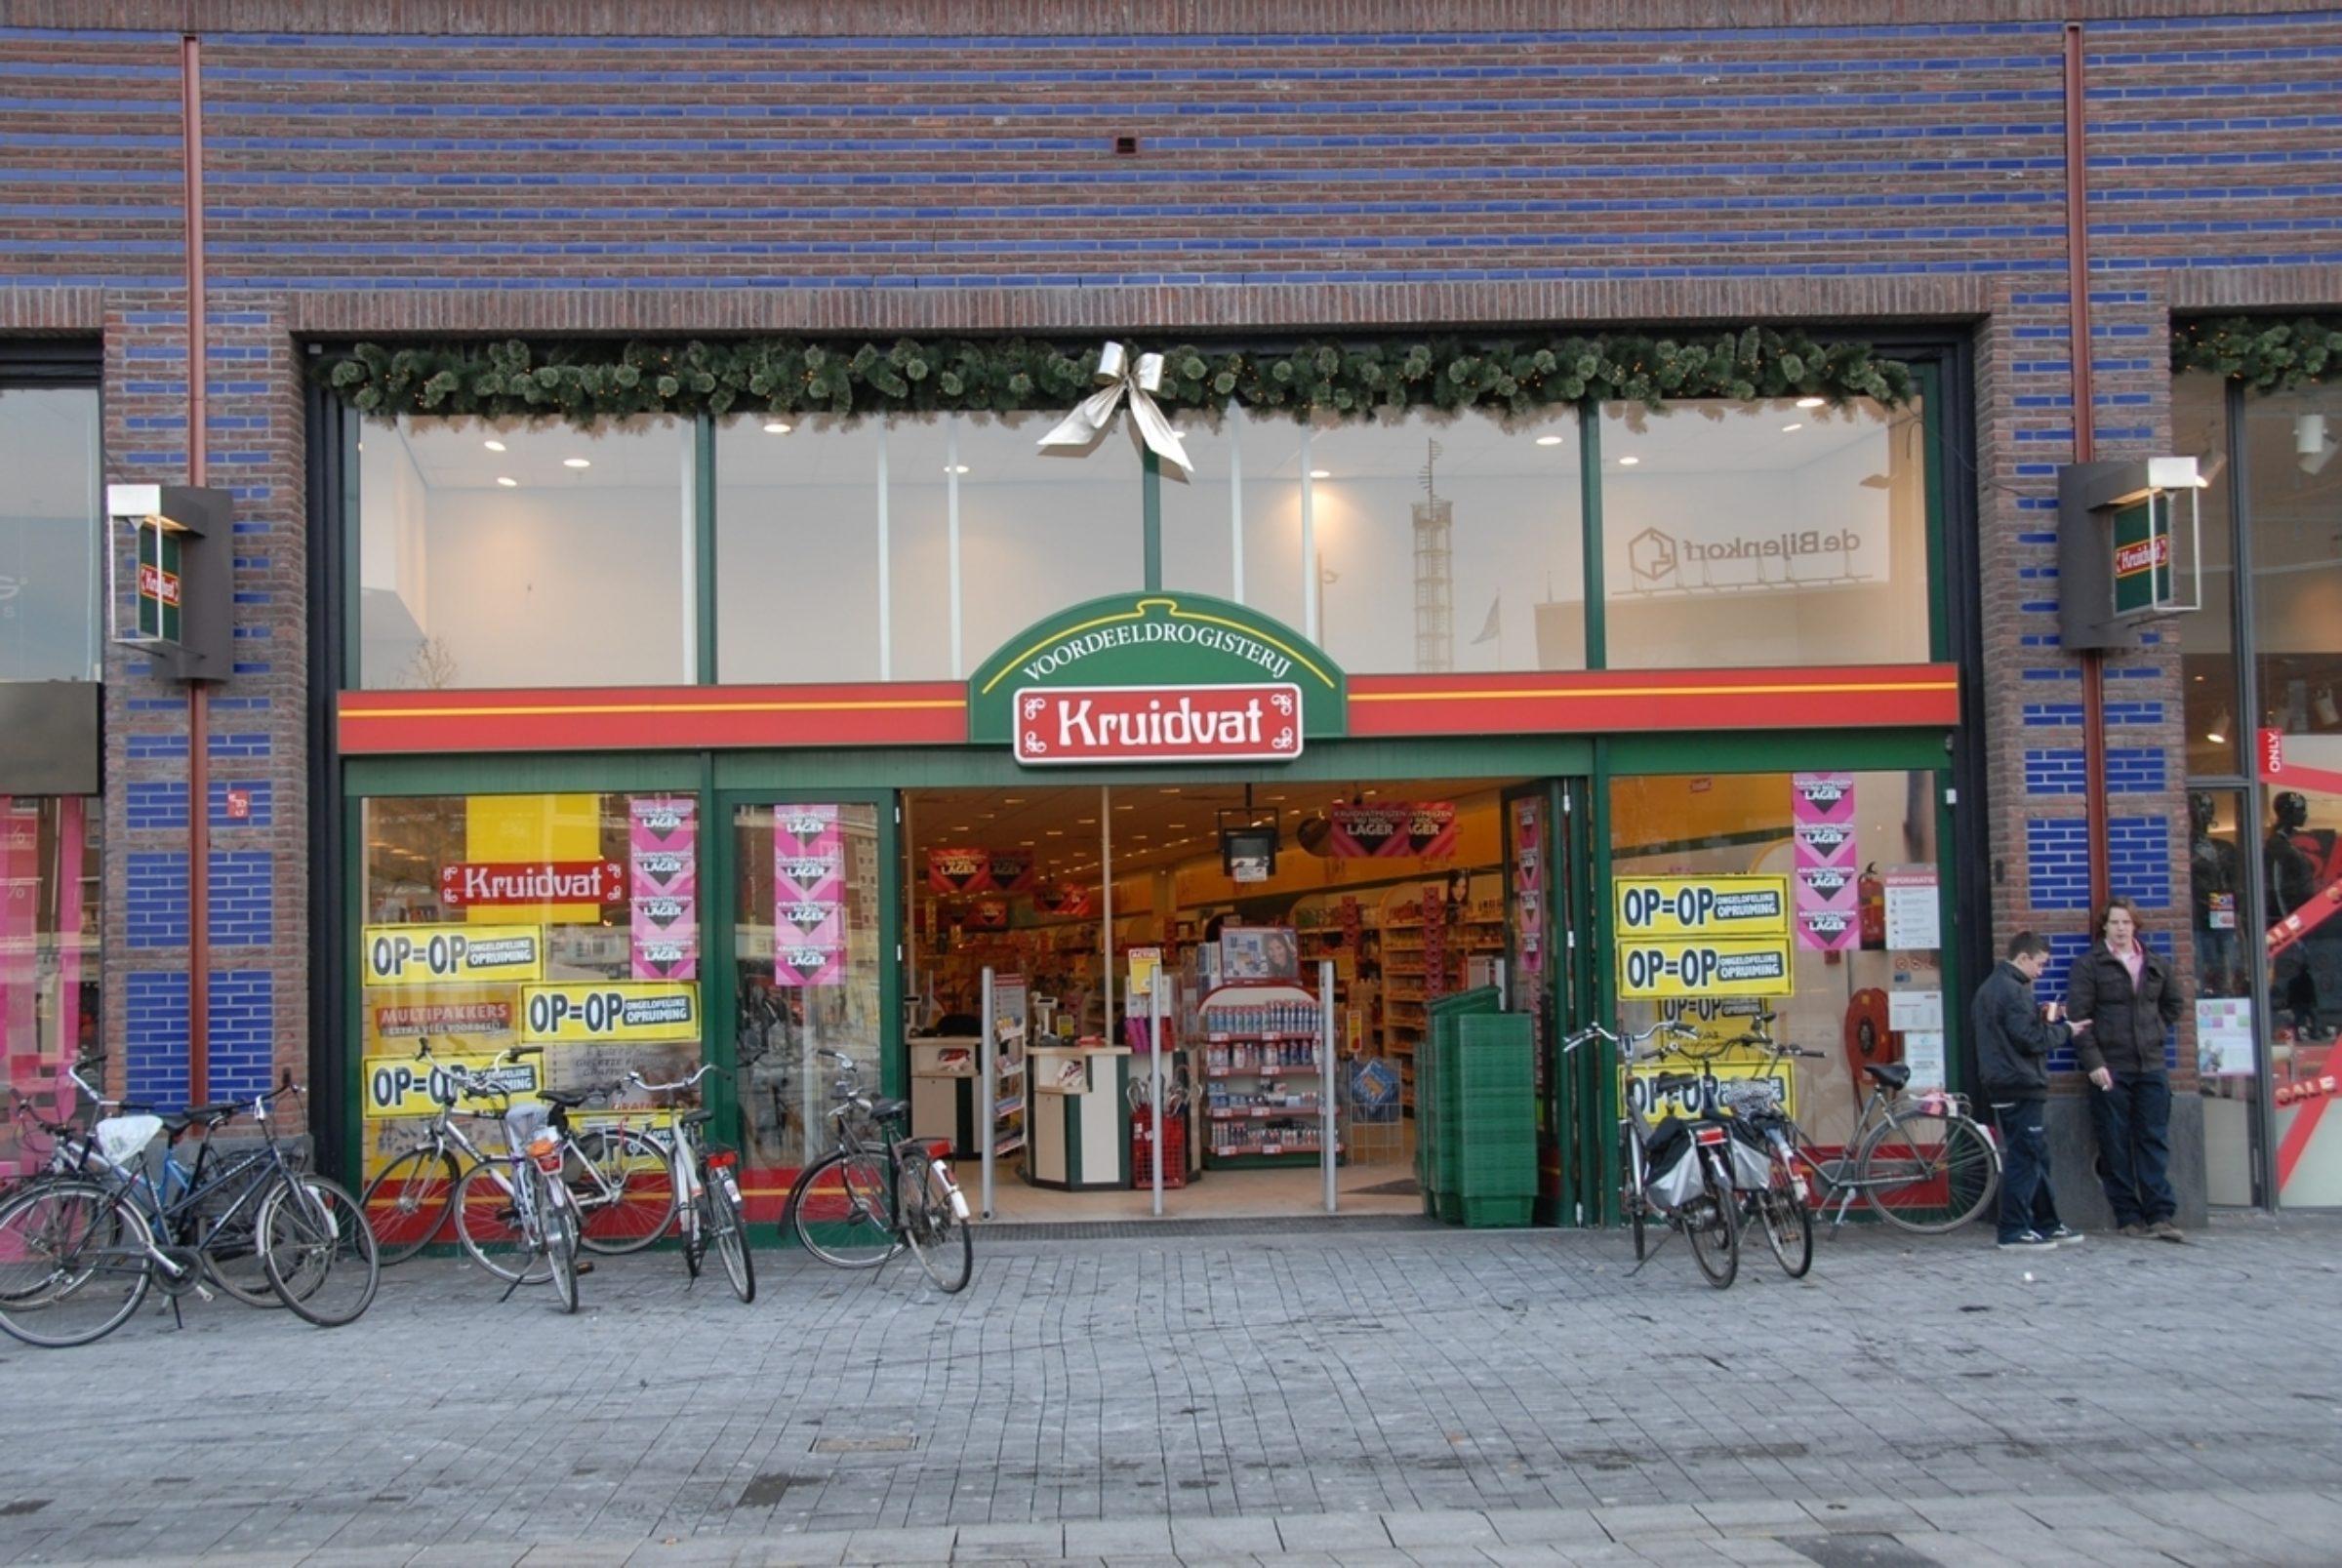 Kruidvat (Klanderij) Enschede